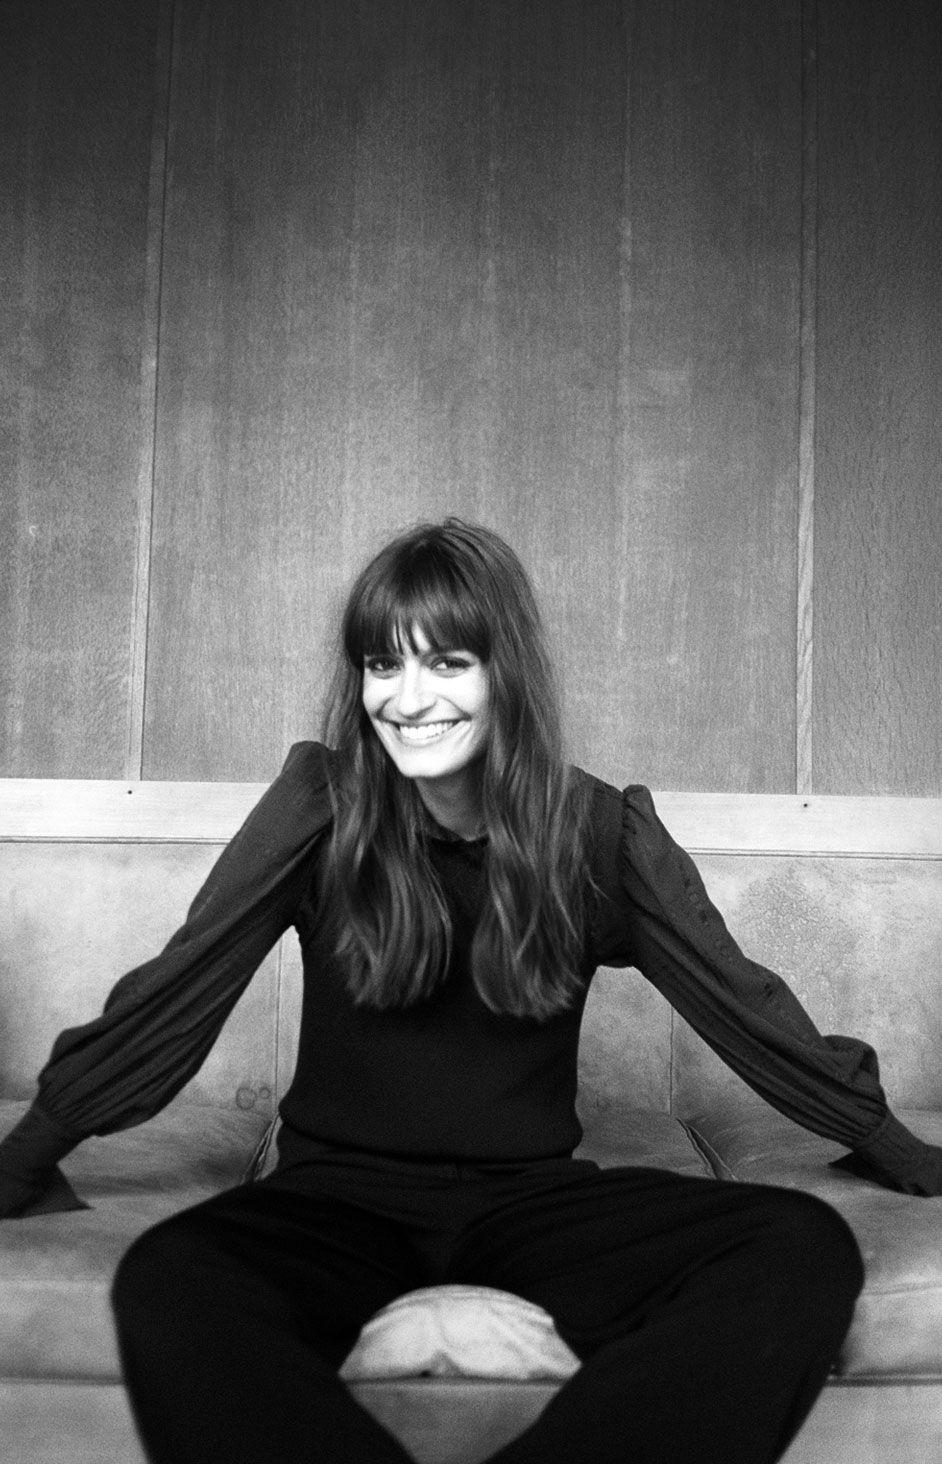 Clara Luciani noir et blanc edito